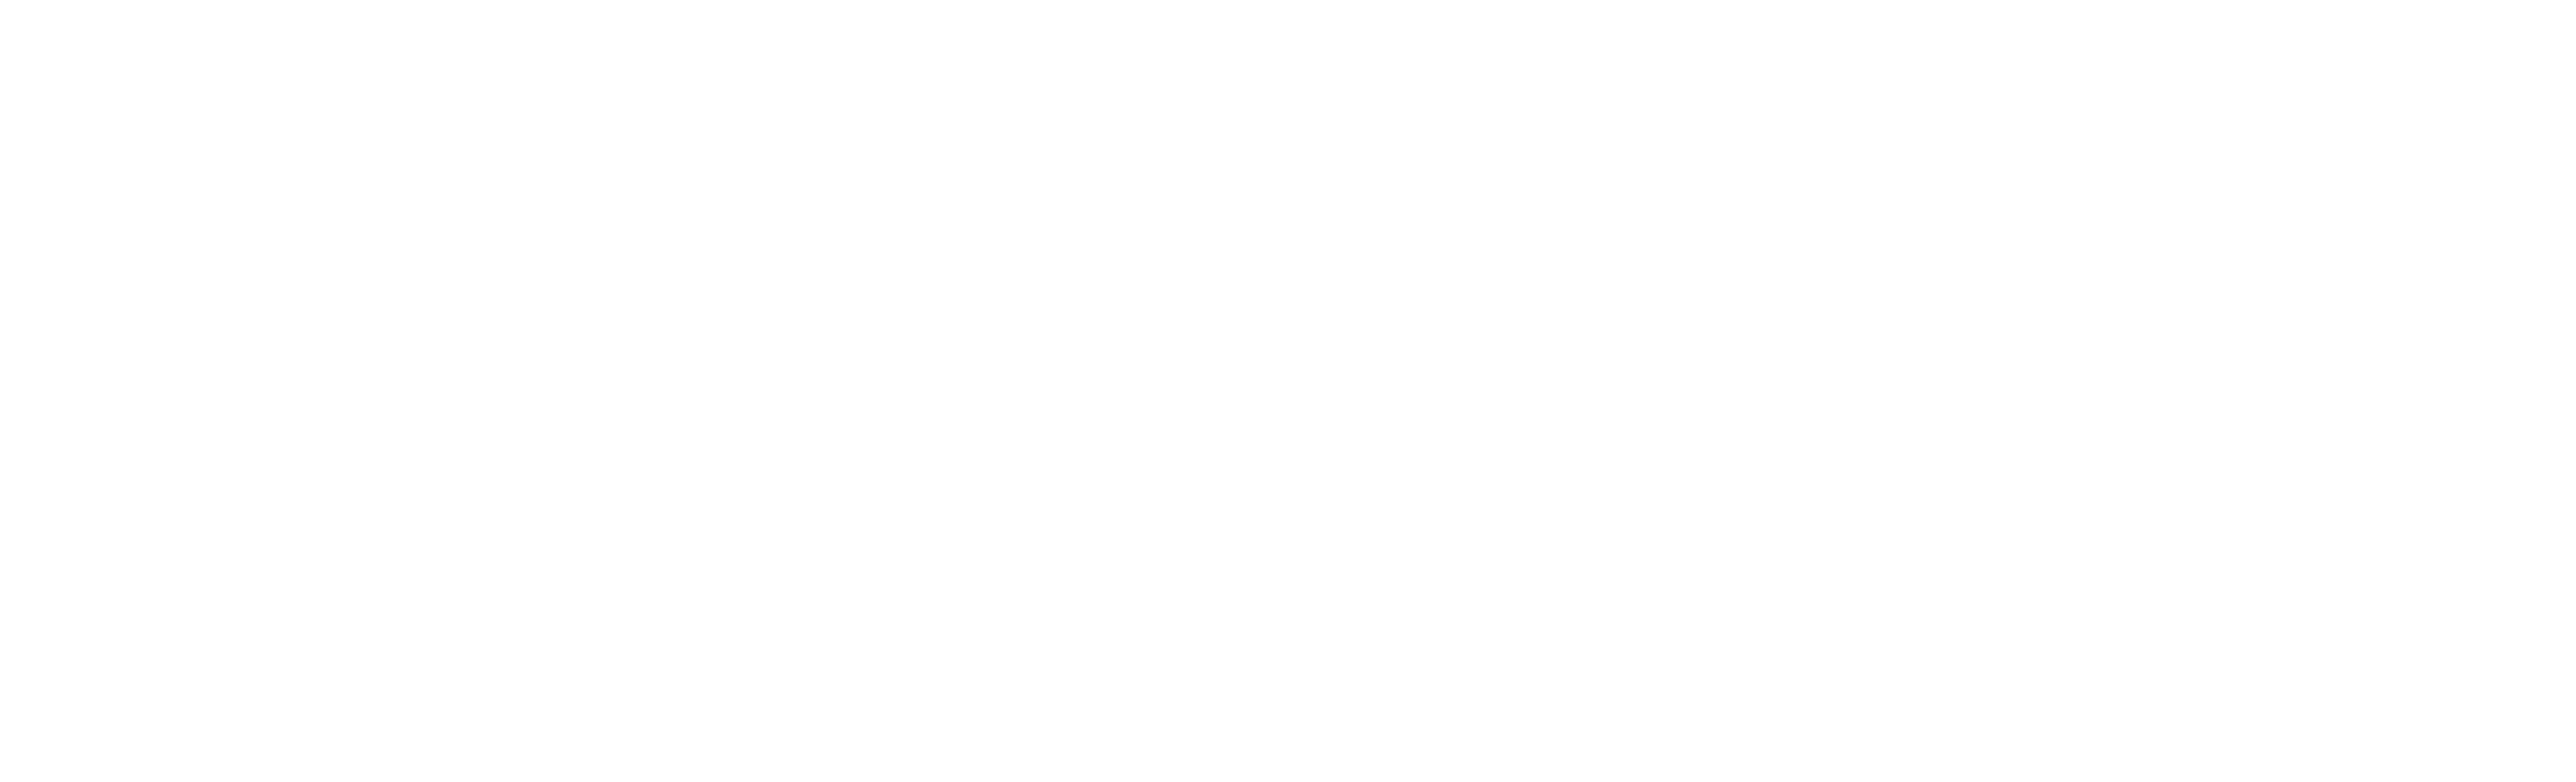 Growclass logo